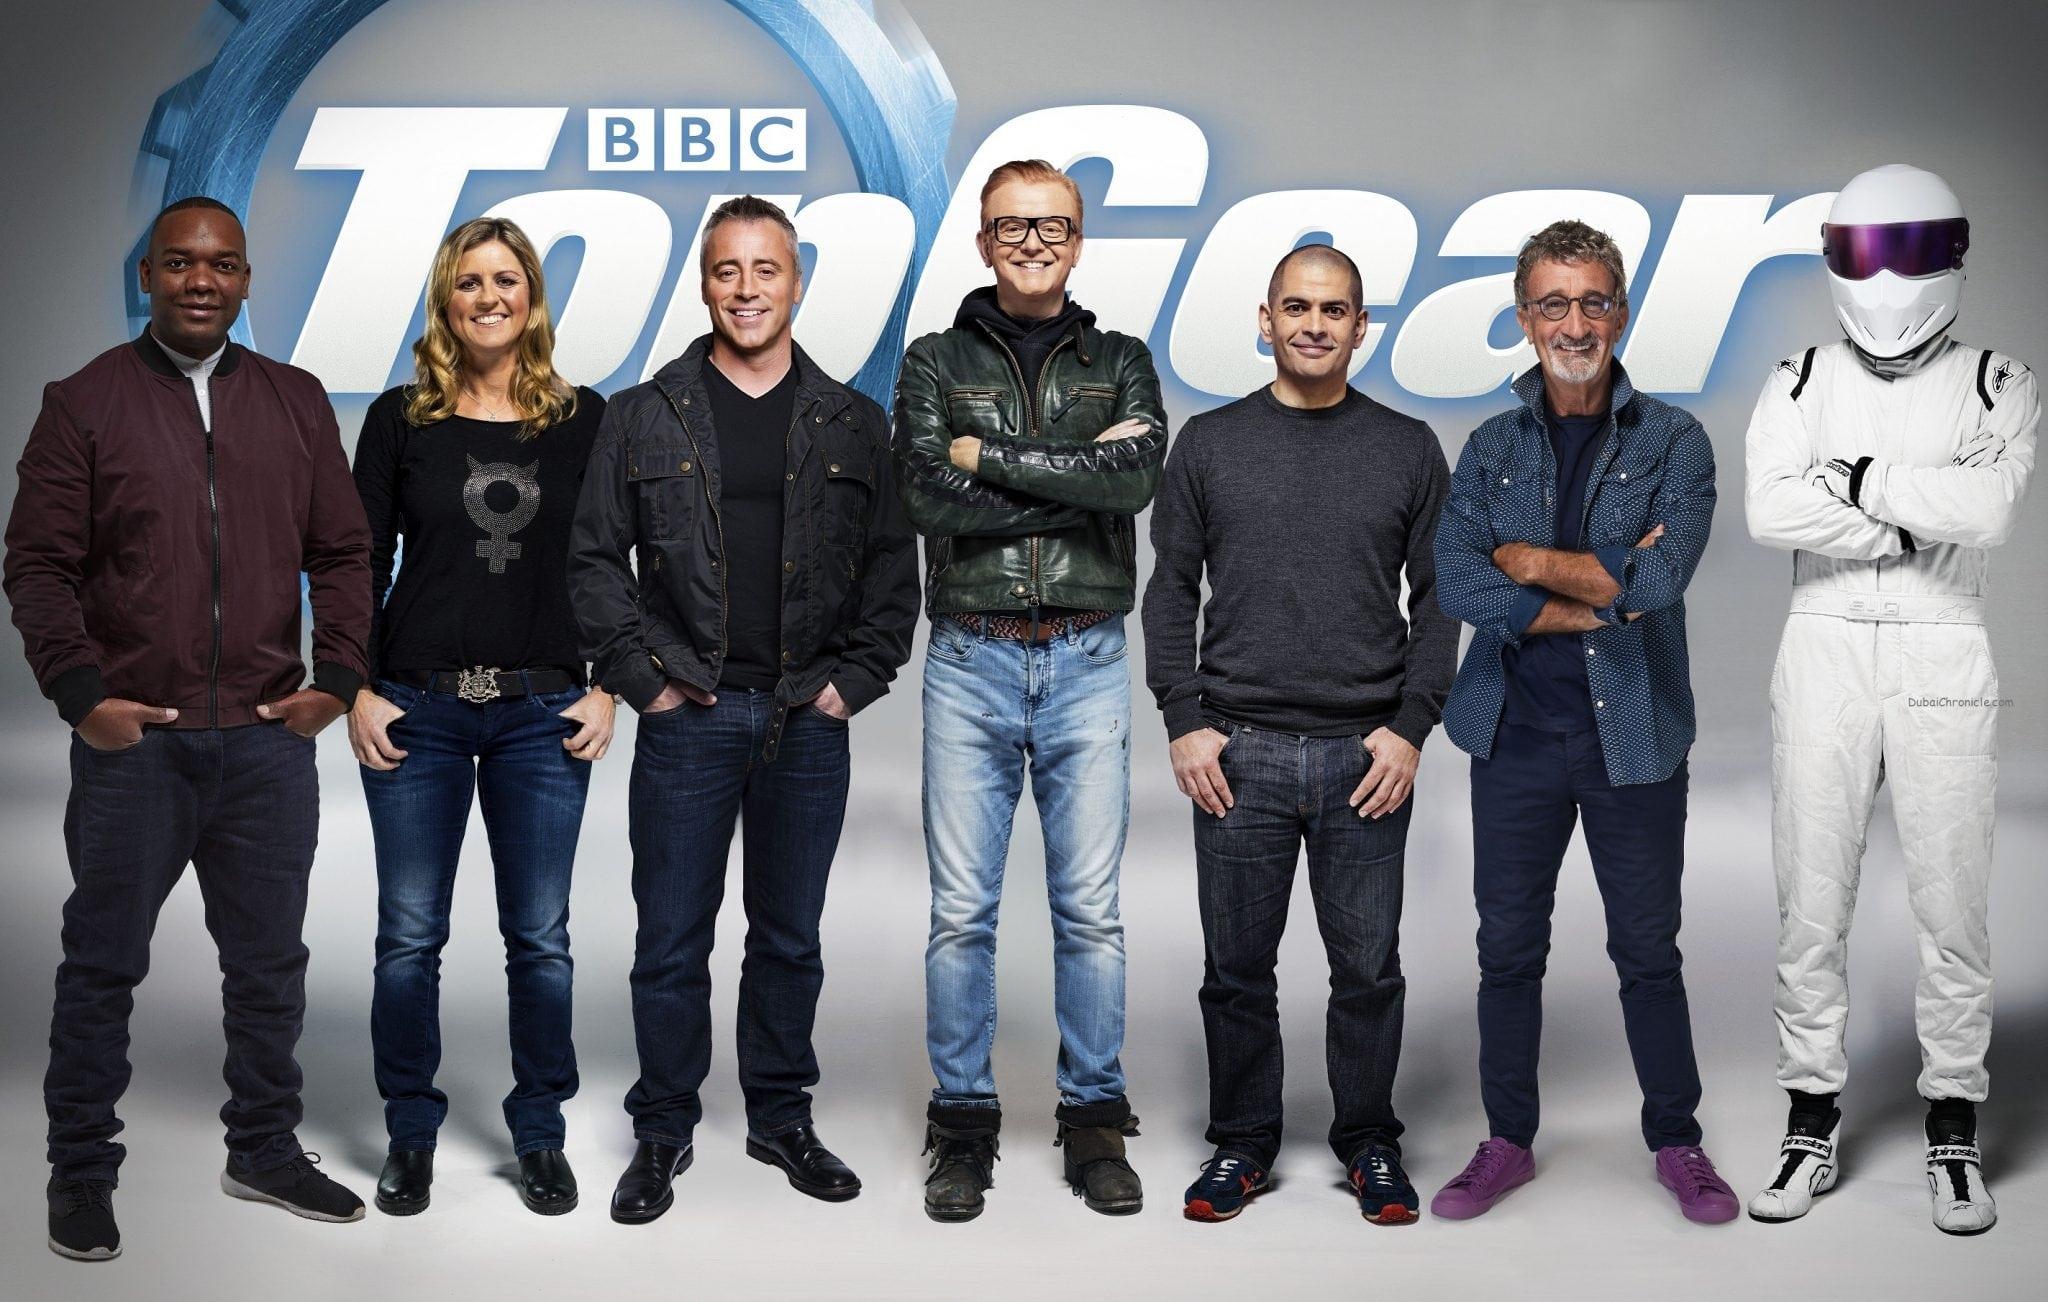 Credit - BBC Top Gear Magazine